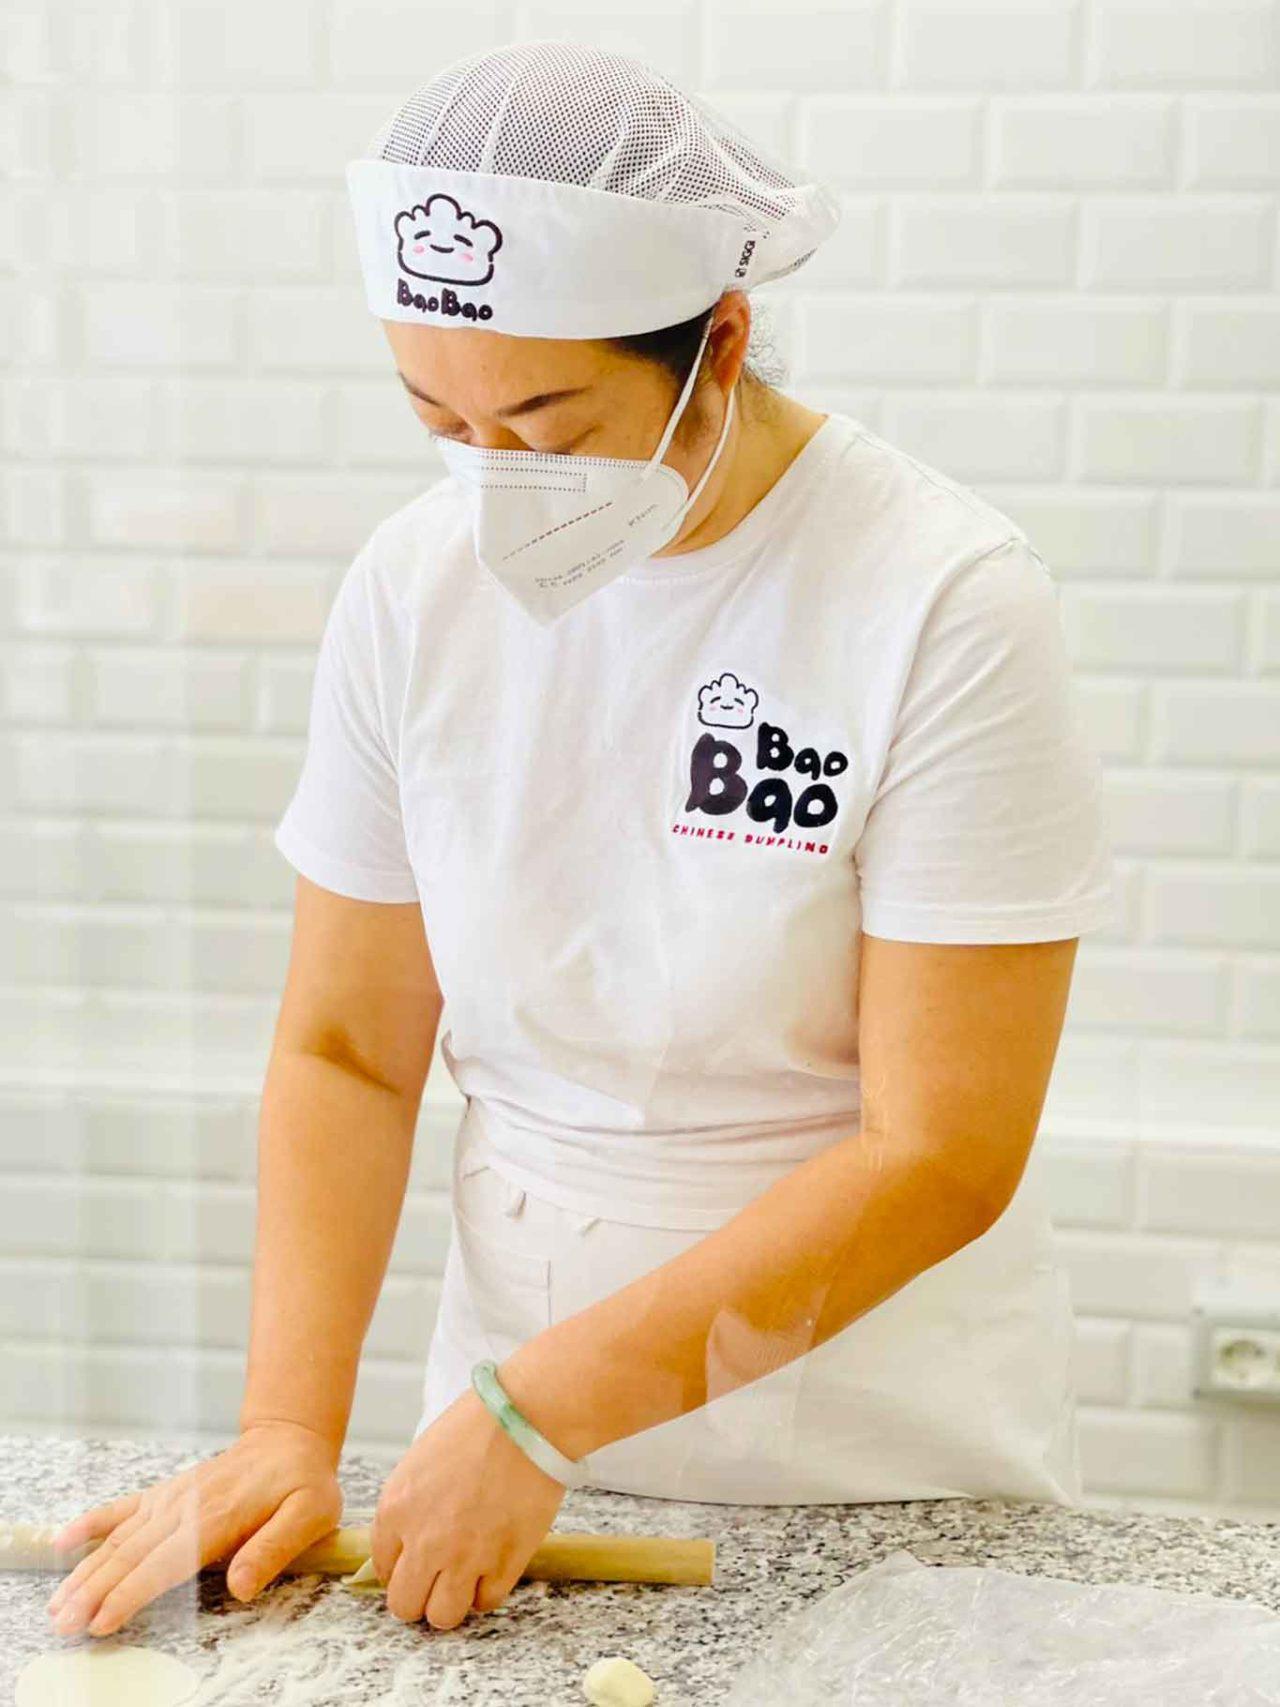 Bao Bao Dumpling Roma cucina